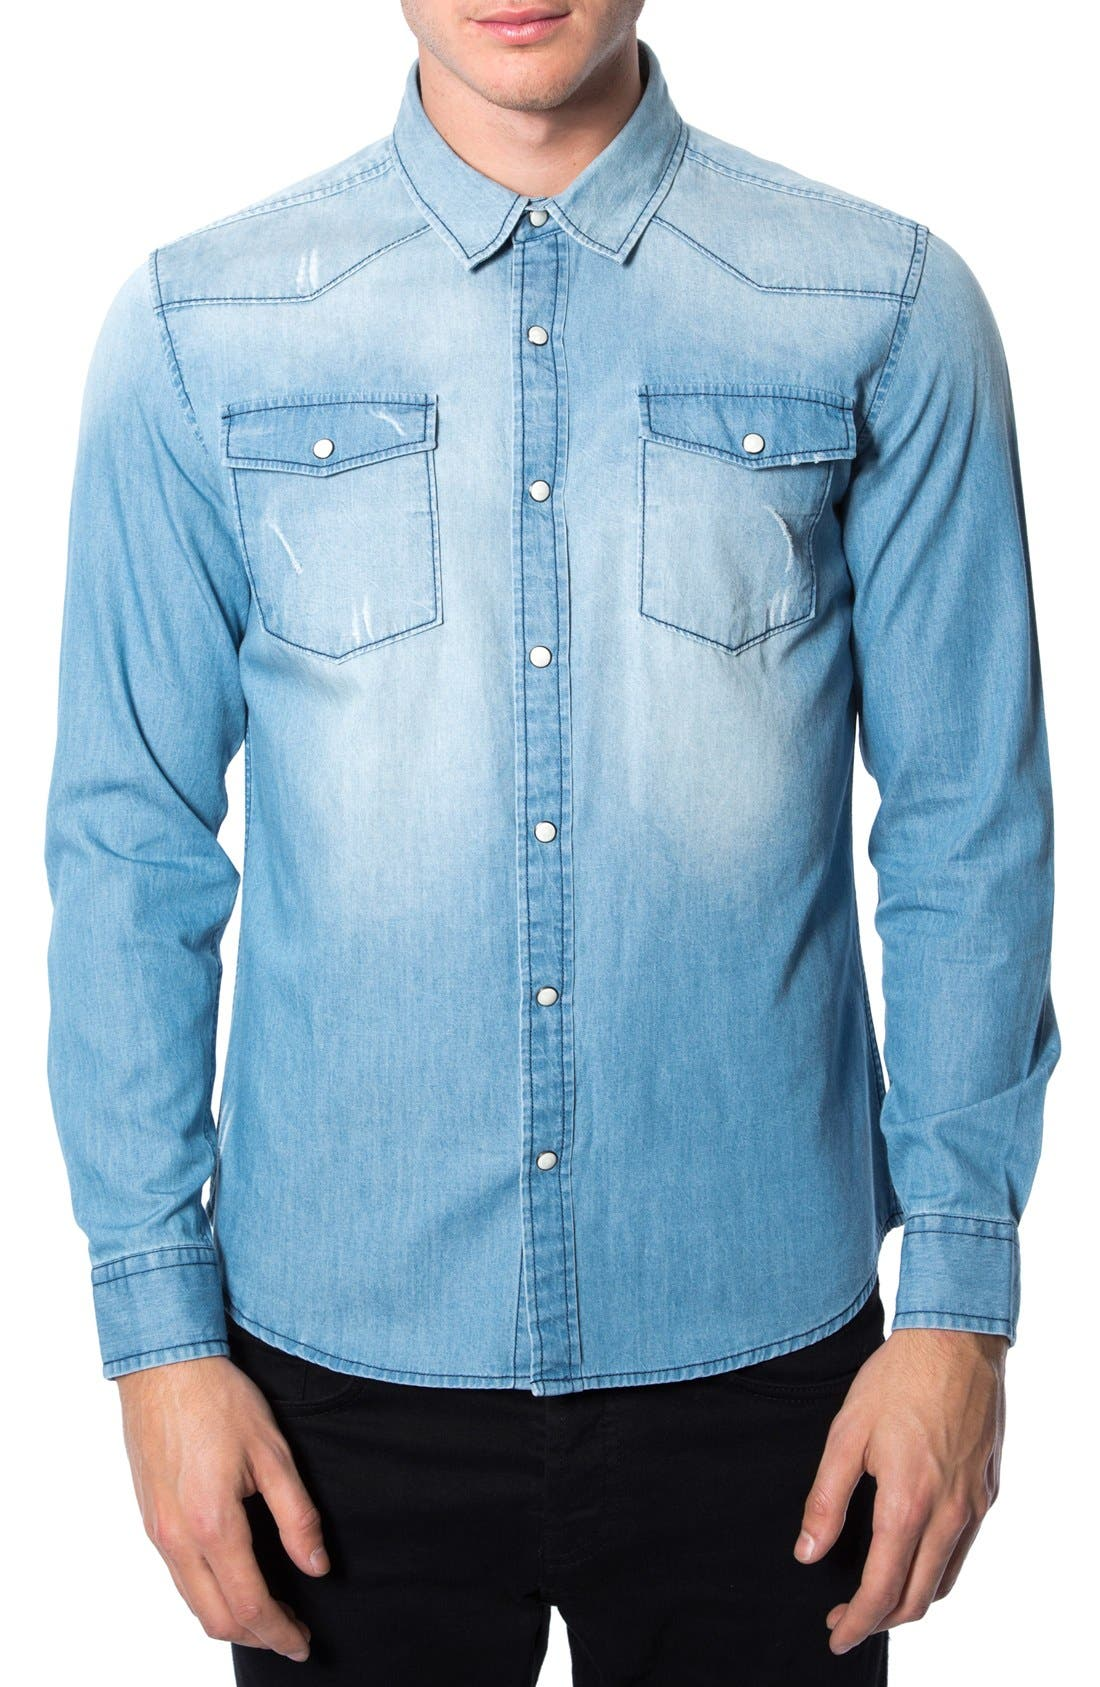 'Beyond Me' Trim Fit Chambray Shirt,                         Main,                         color, 400